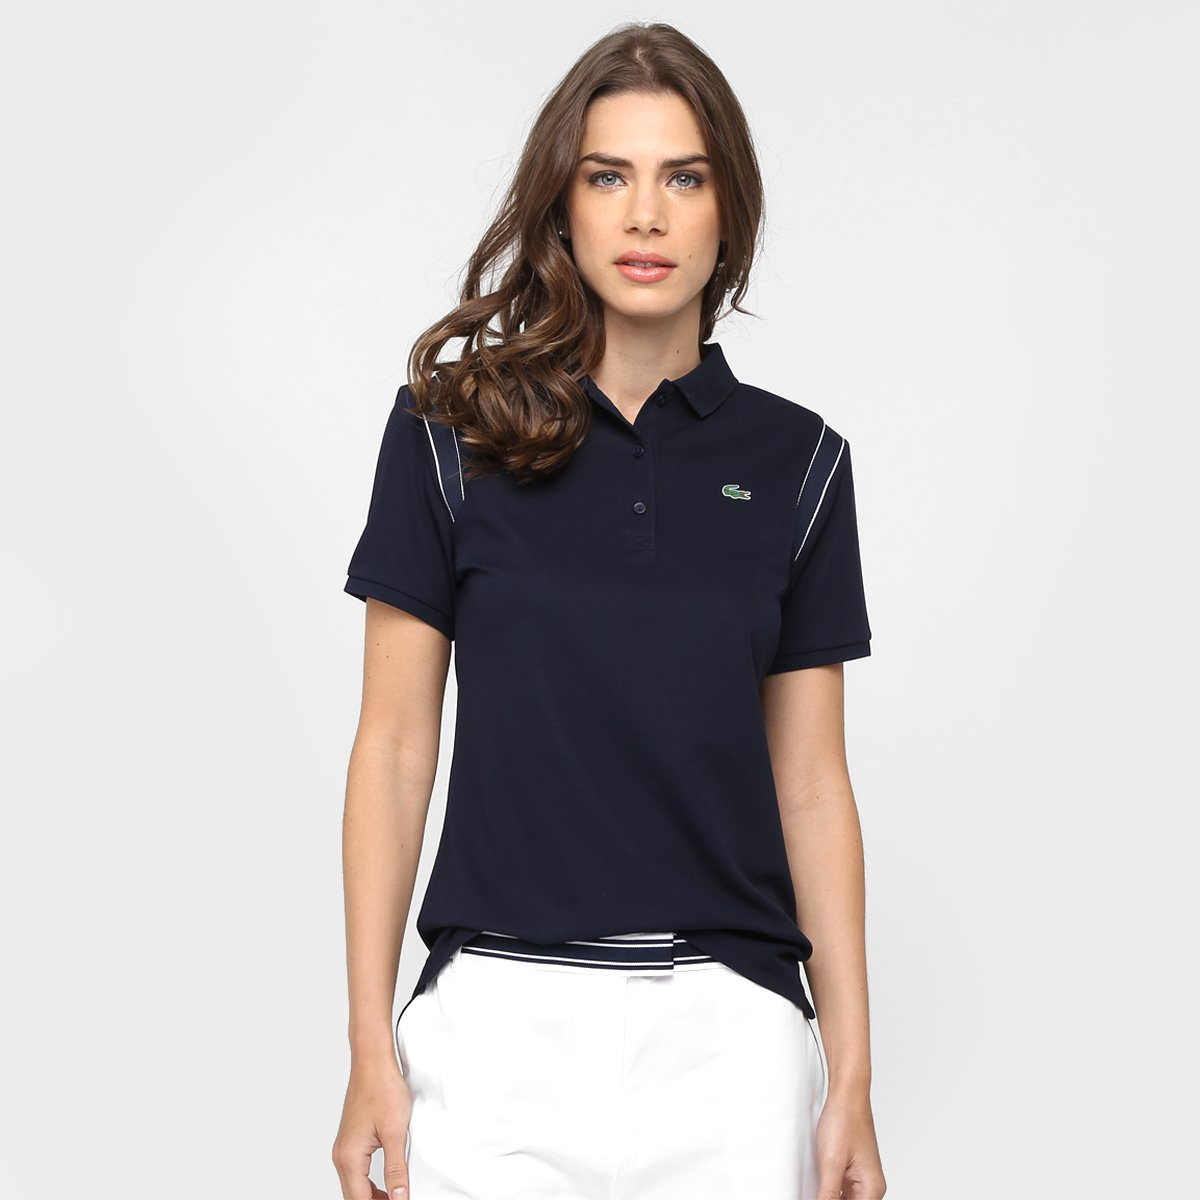 9aa38d8d6fbfe Camisa Polo Lacoste Listrada Fancy Gola Gancho - Compre Agora   Netshoes